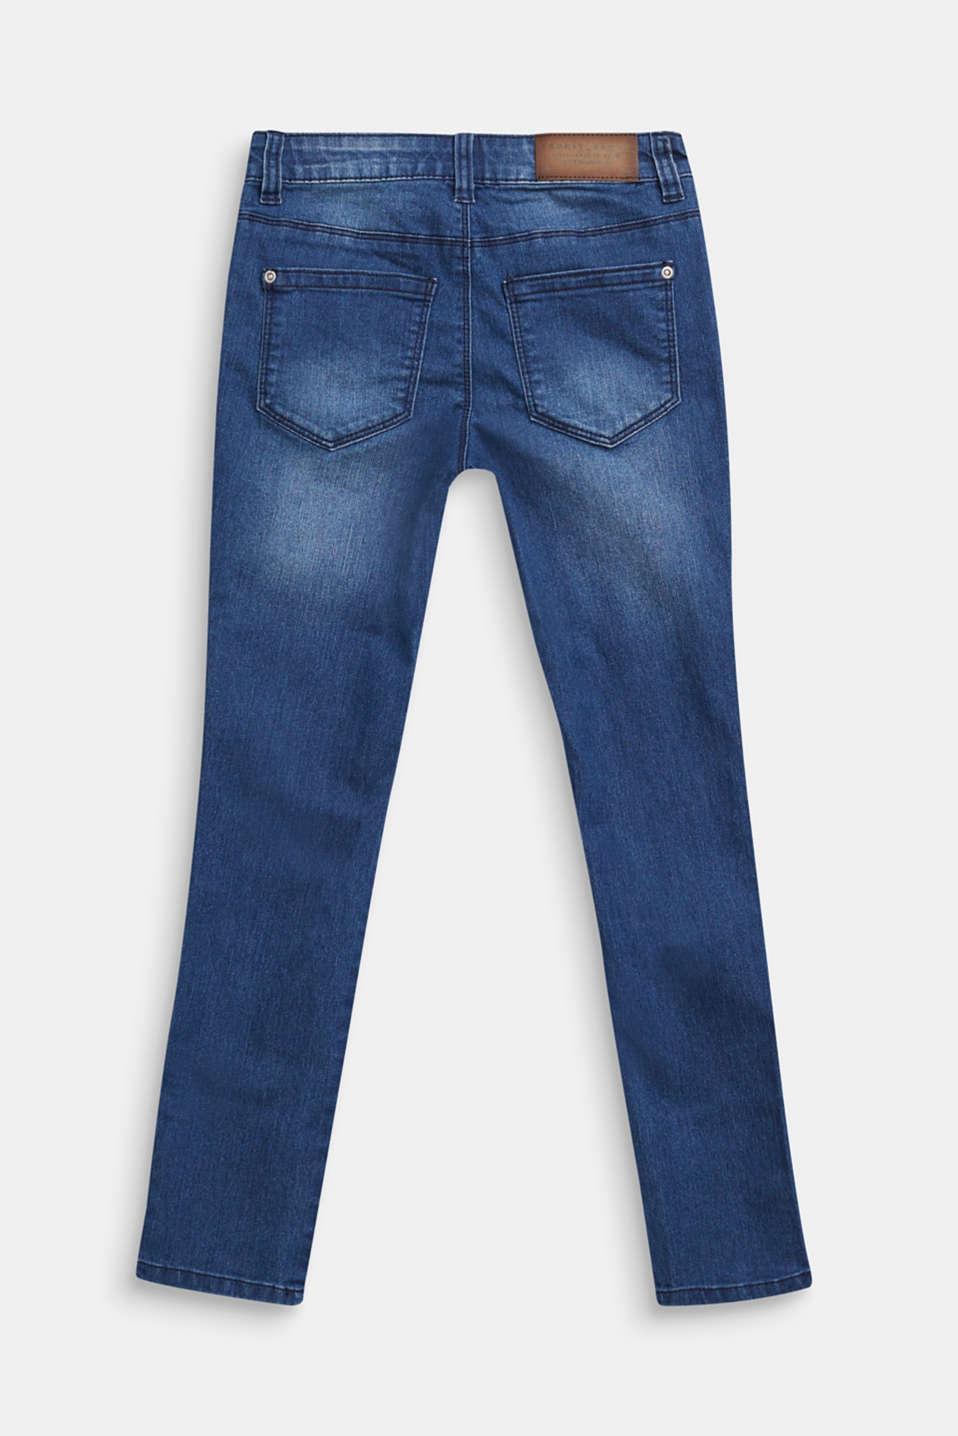 Jeans with glittering side stripes, LCDARK INDIGO DE, detail image number 1